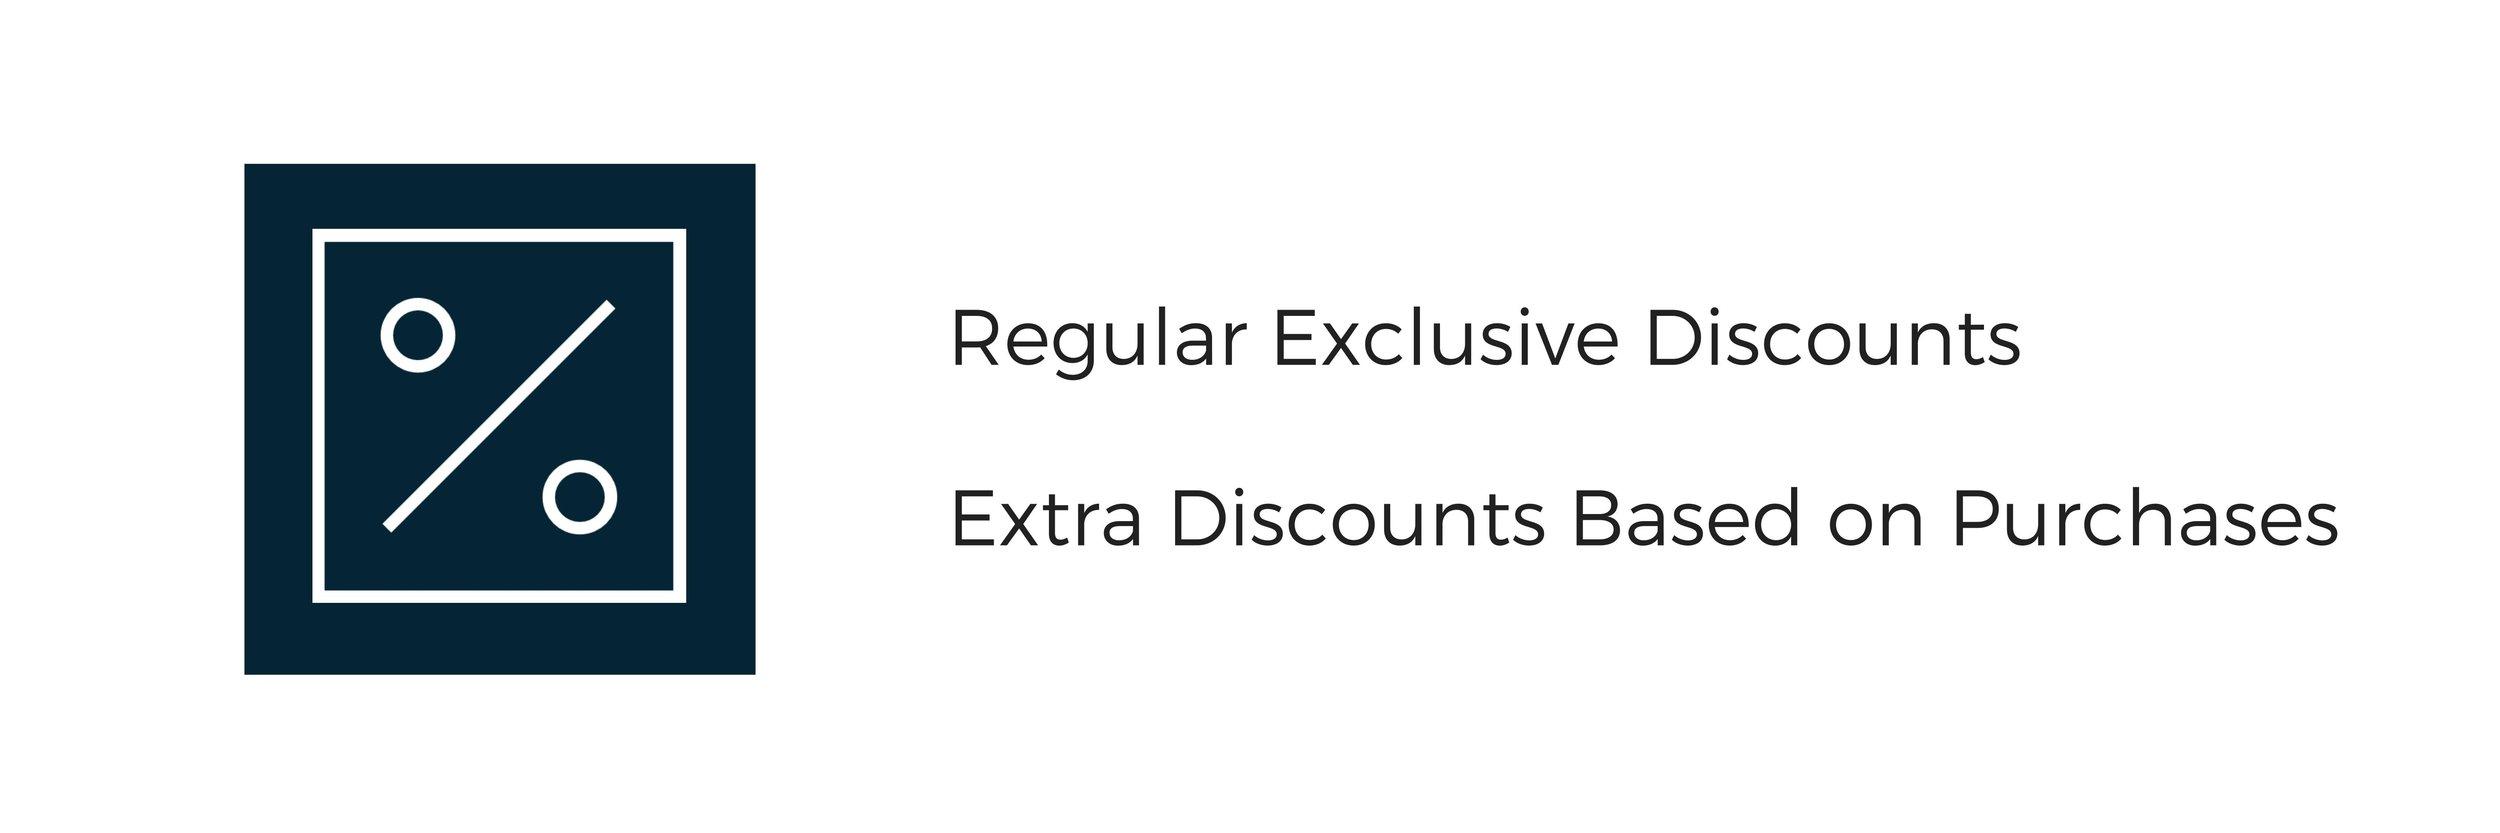 Humaiyra Discounts